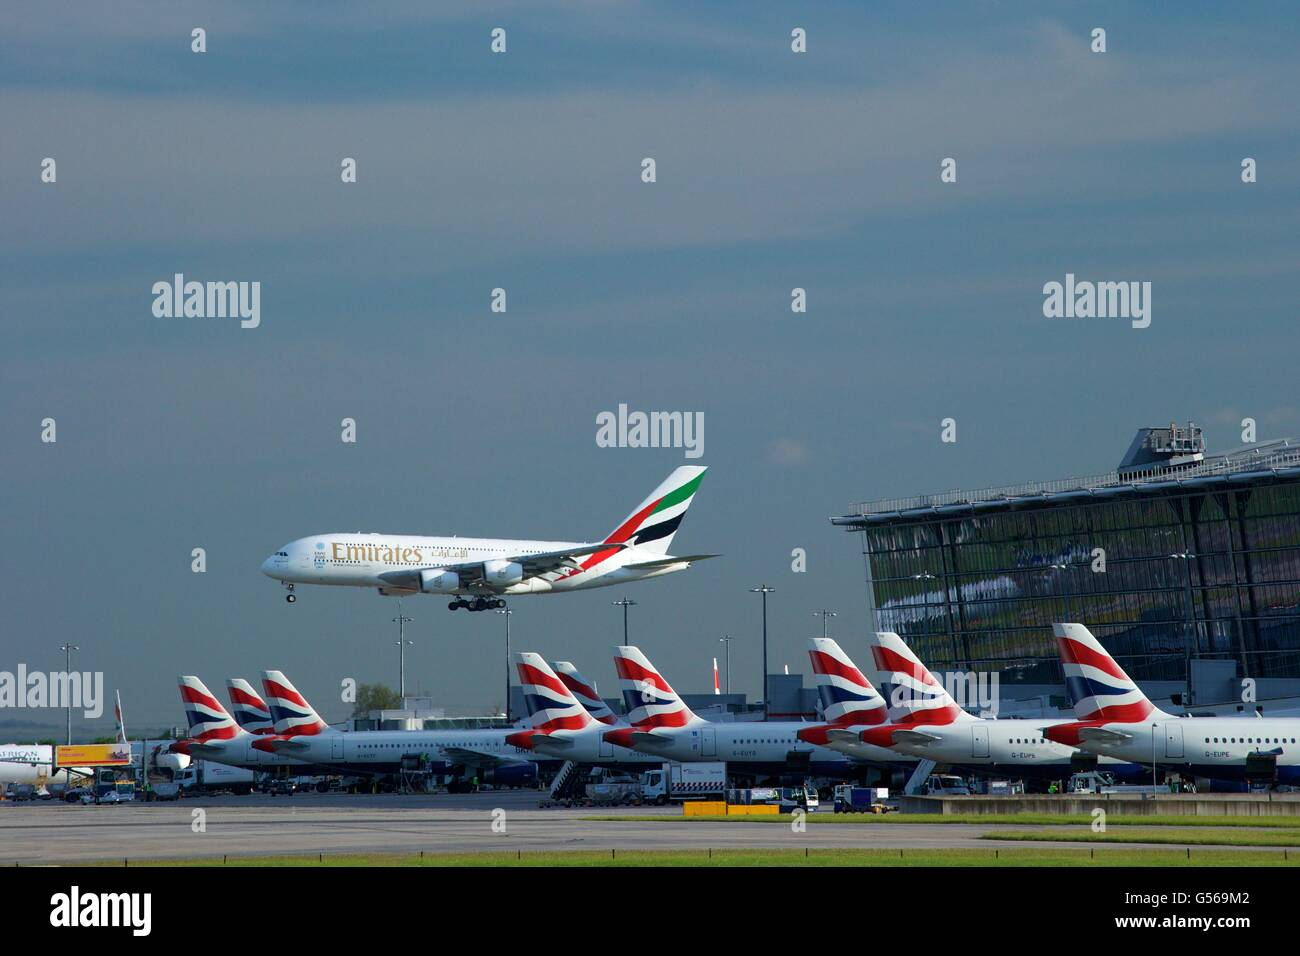 Emirates flight landing at Heathrow Airport with Terminal 5 behind, London, England, UK, GB, - Stock Image